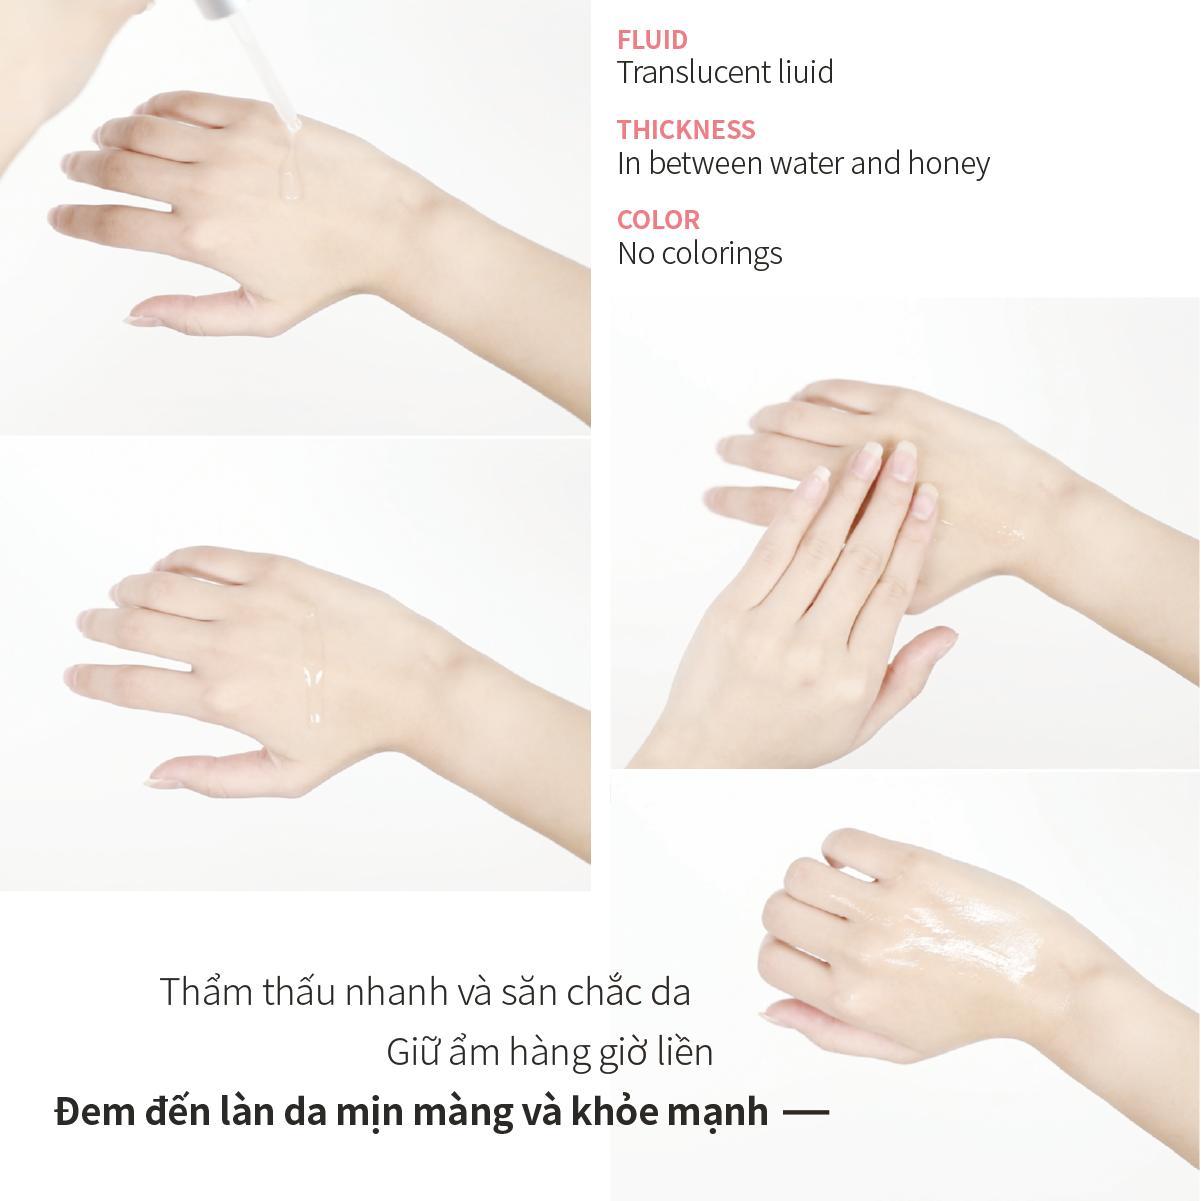 Tinh Chất Dưỡng Ẩm Chống Lão Hóa - Young &be Facial Synergy Ampoule